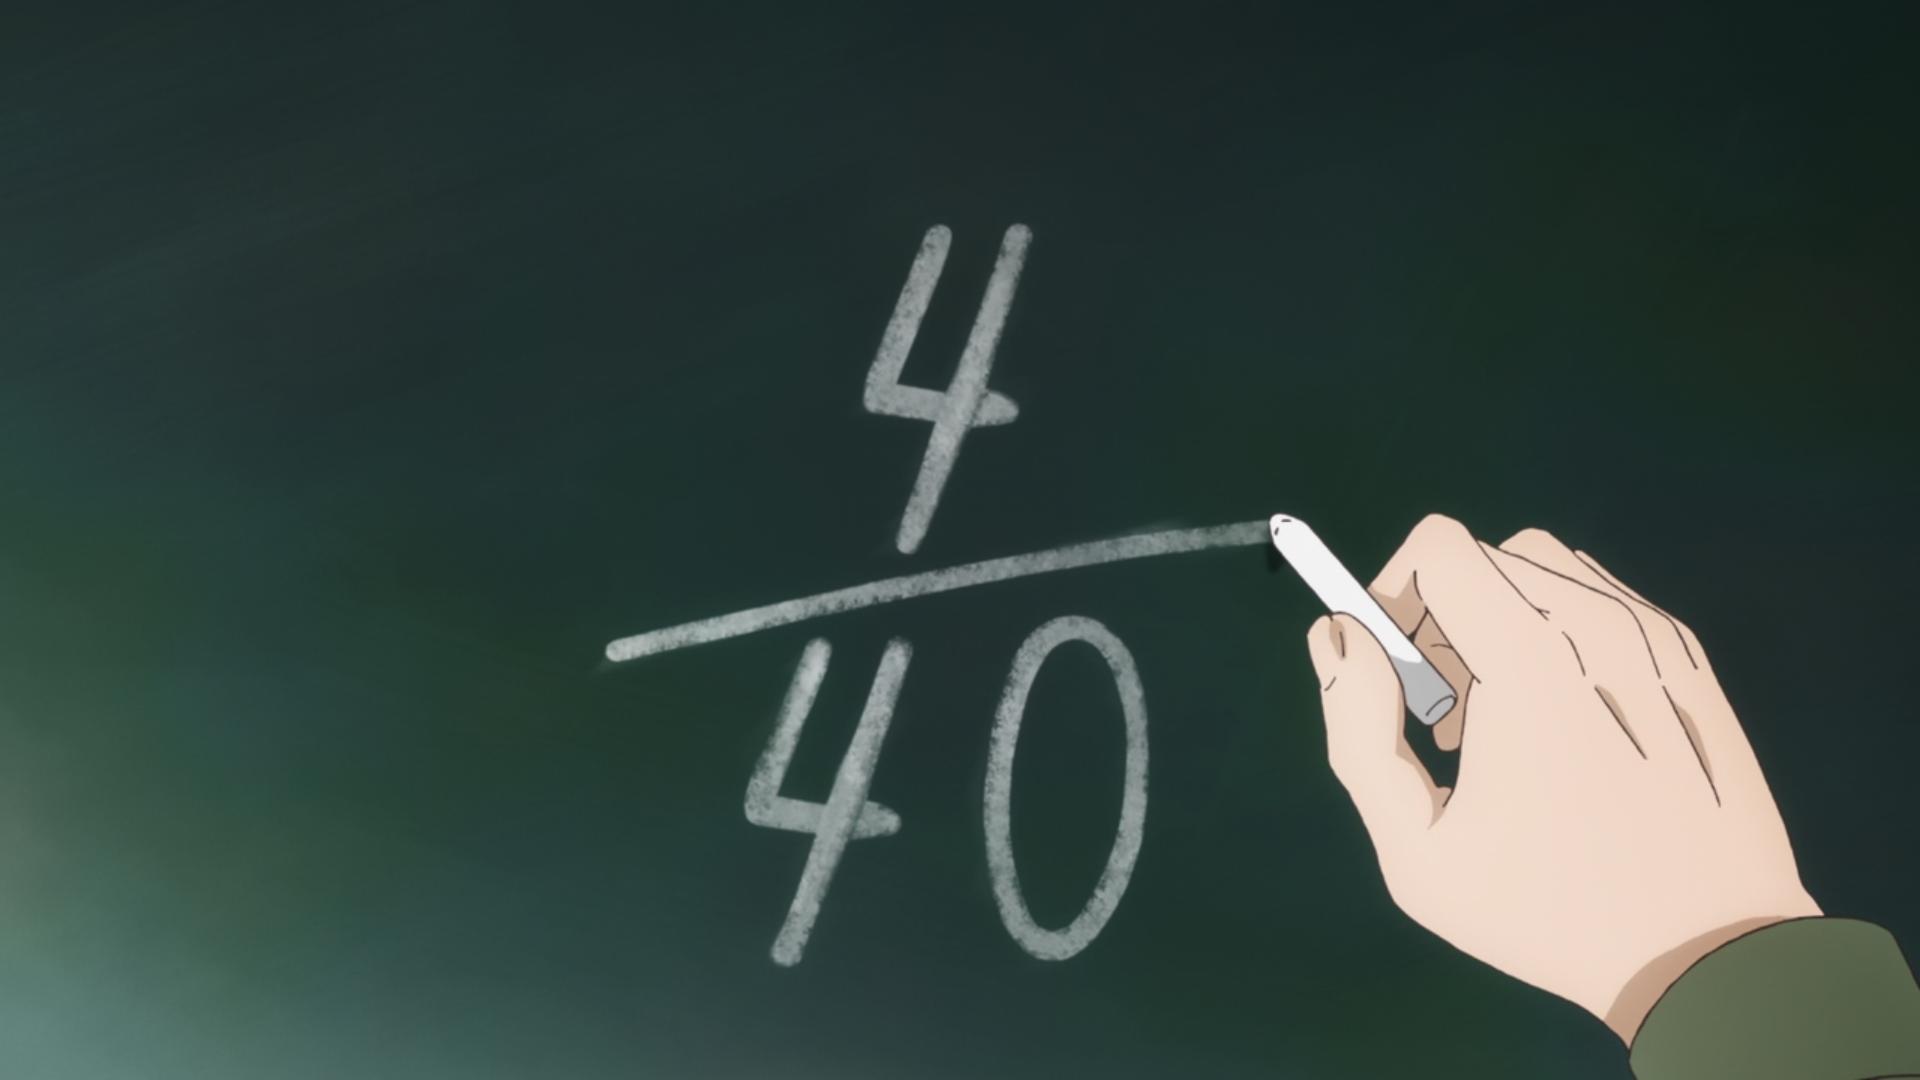 kageki shojo episode 11 4/40